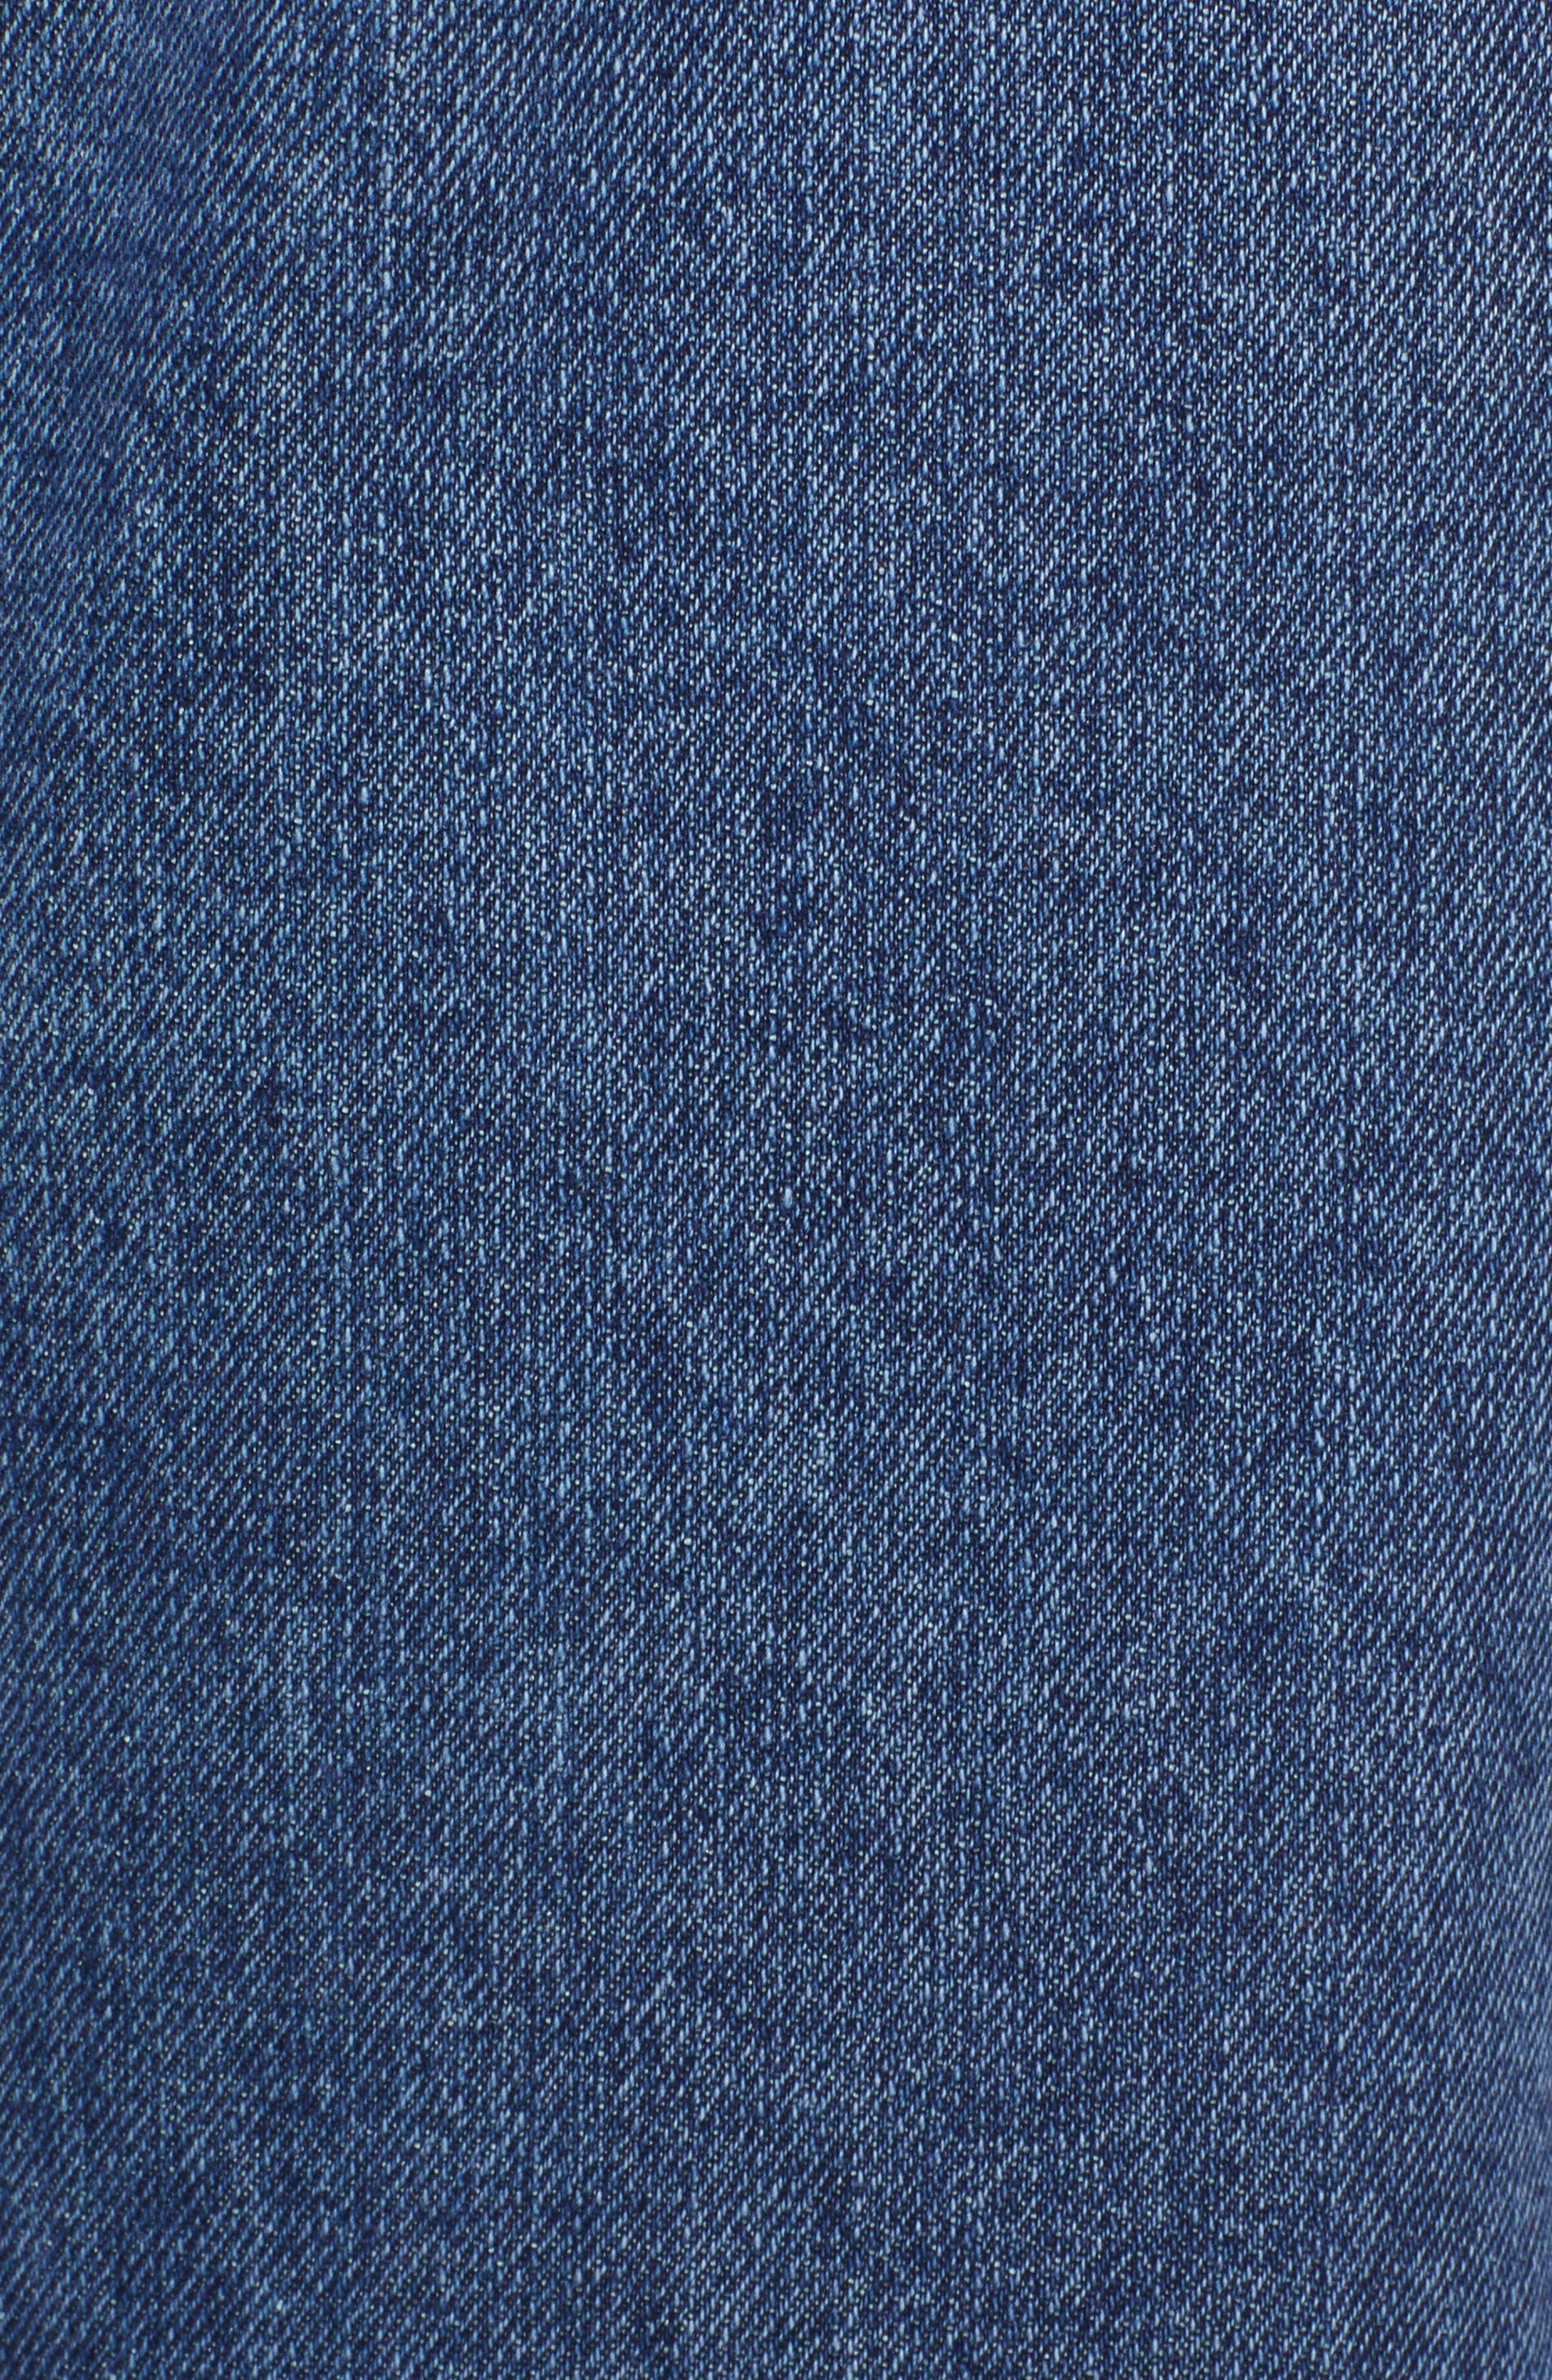 High Waist Straight Leg Crop Jeans,                             Alternate thumbnail 6, color,                             401